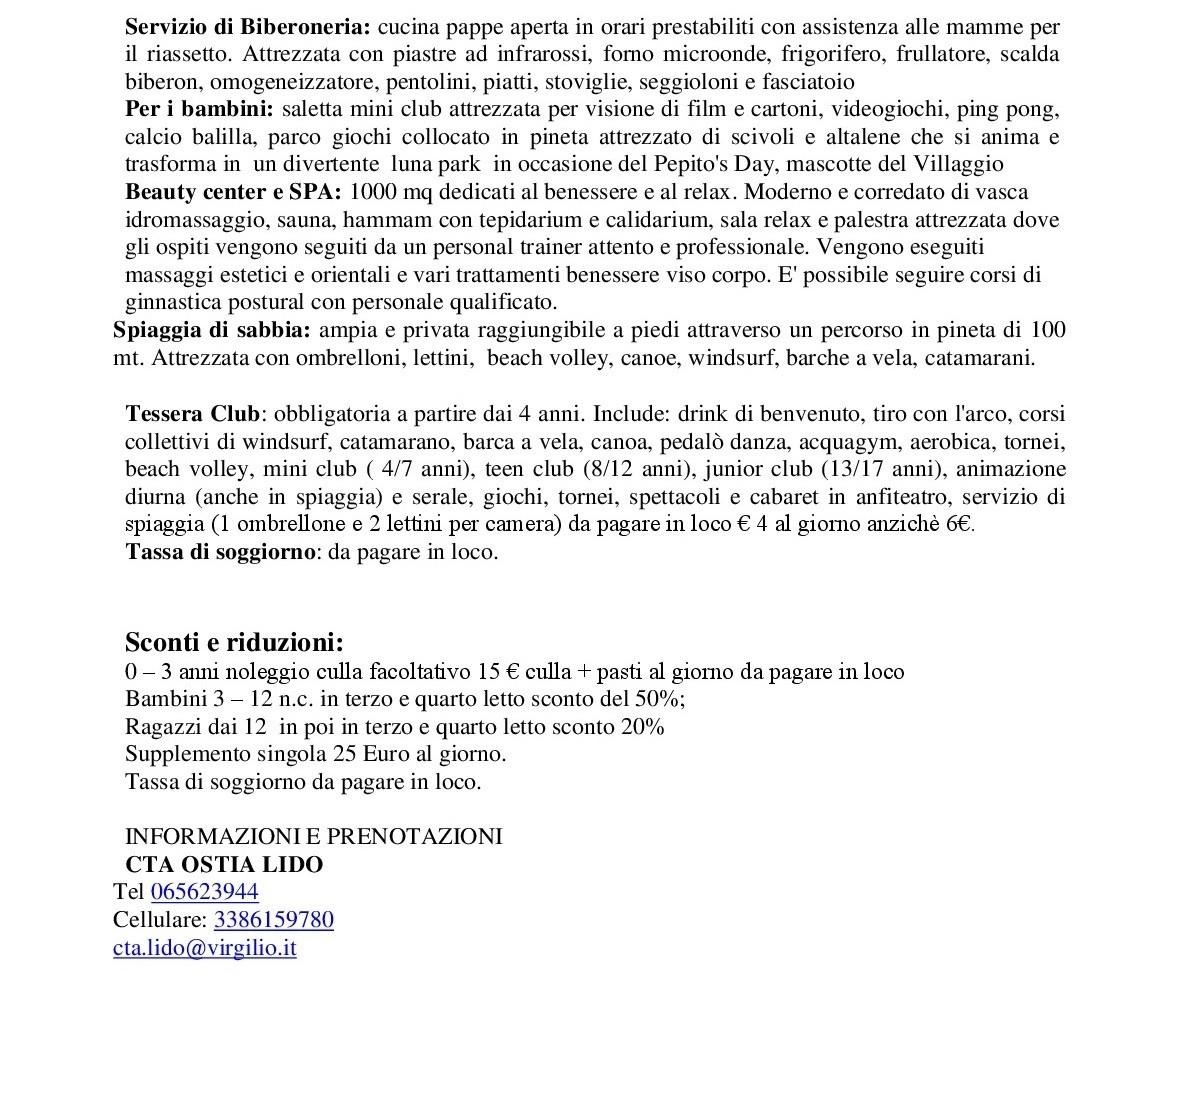 http://acliroma.it/wp-content/uploads/2018/05/marina-di-novara-siri-ostia-lido-002-1.jpg